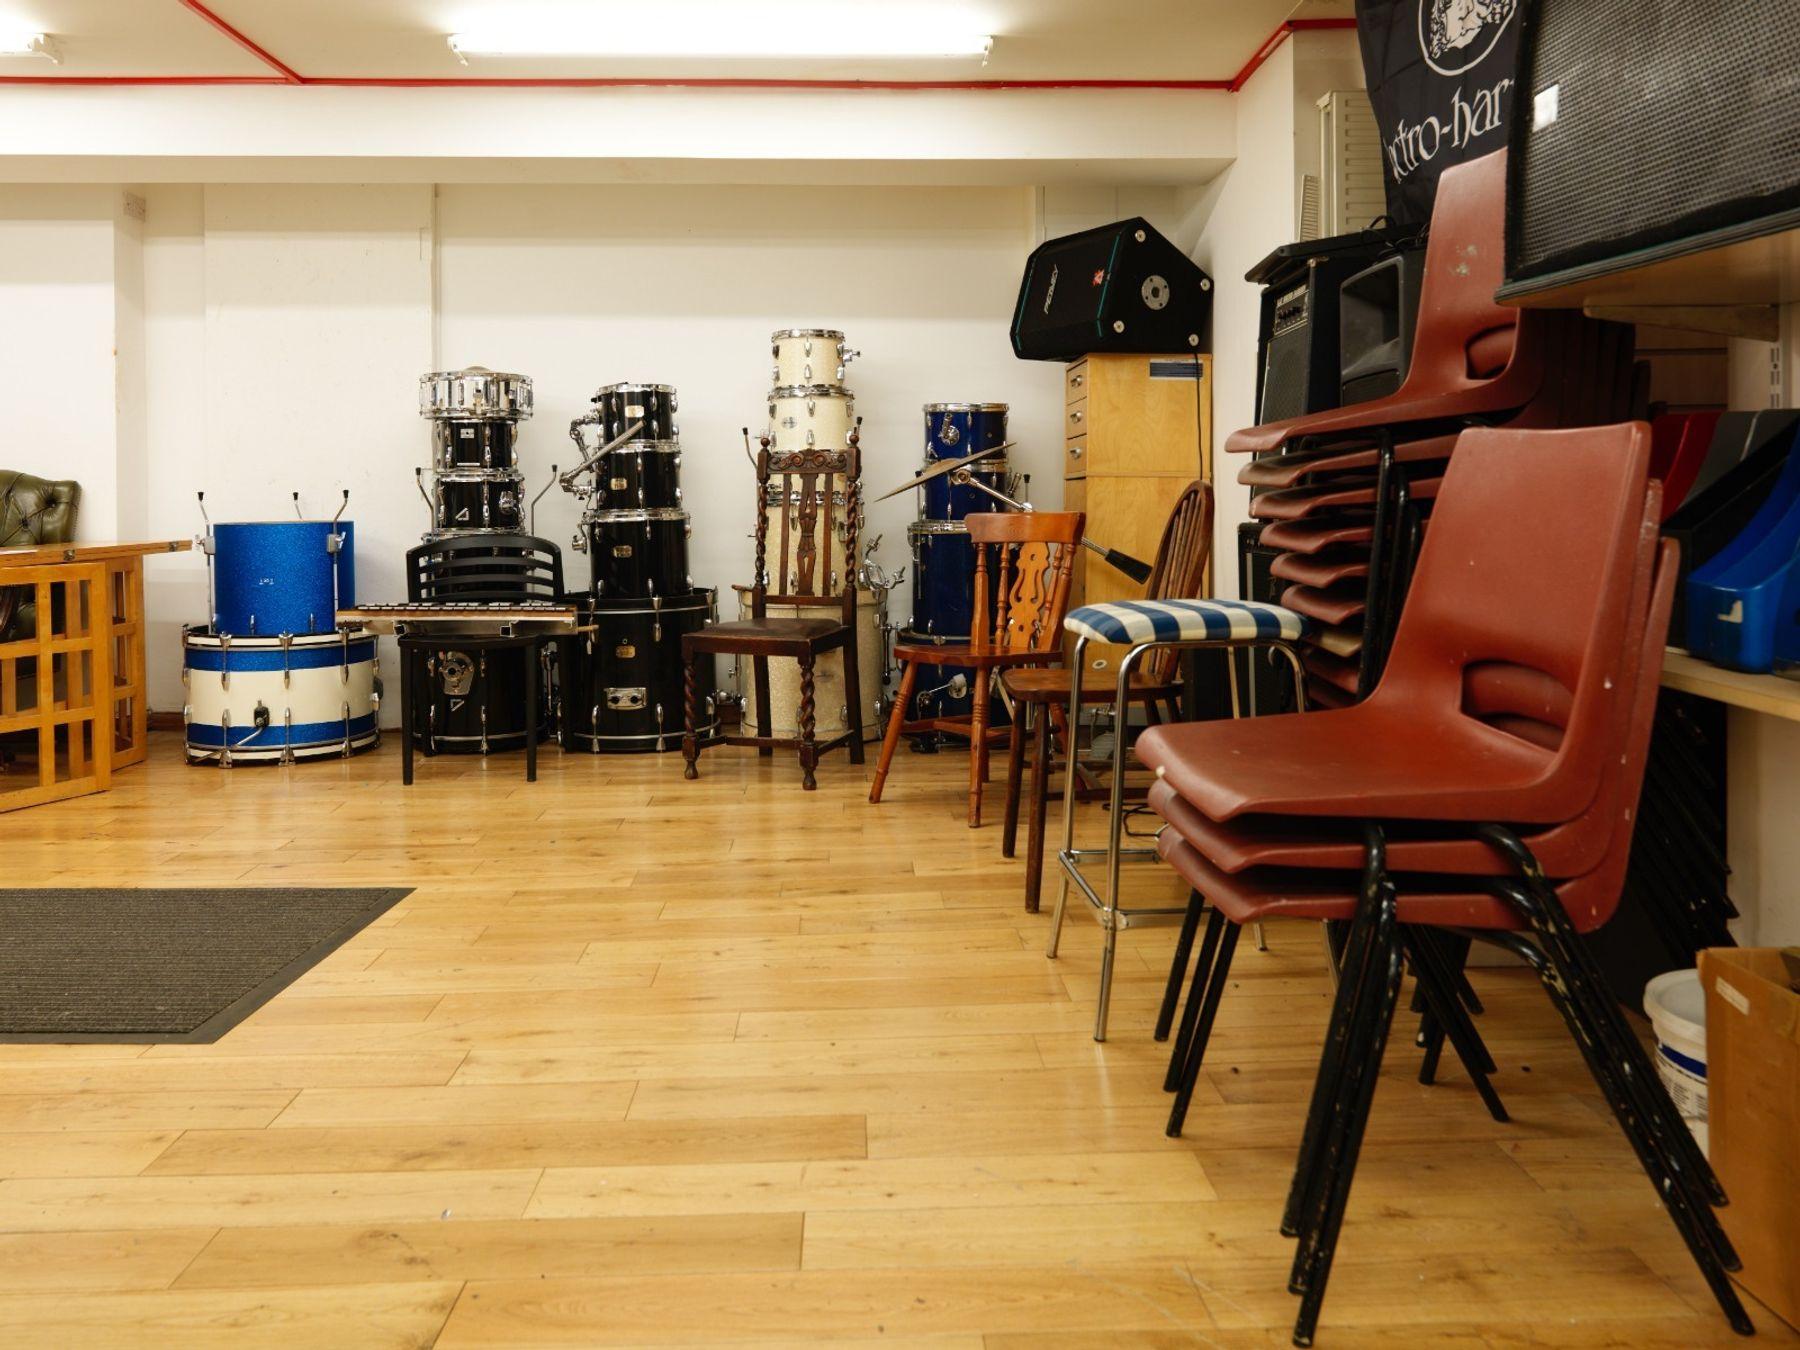 Folkies Music's spacious basement KILBURN